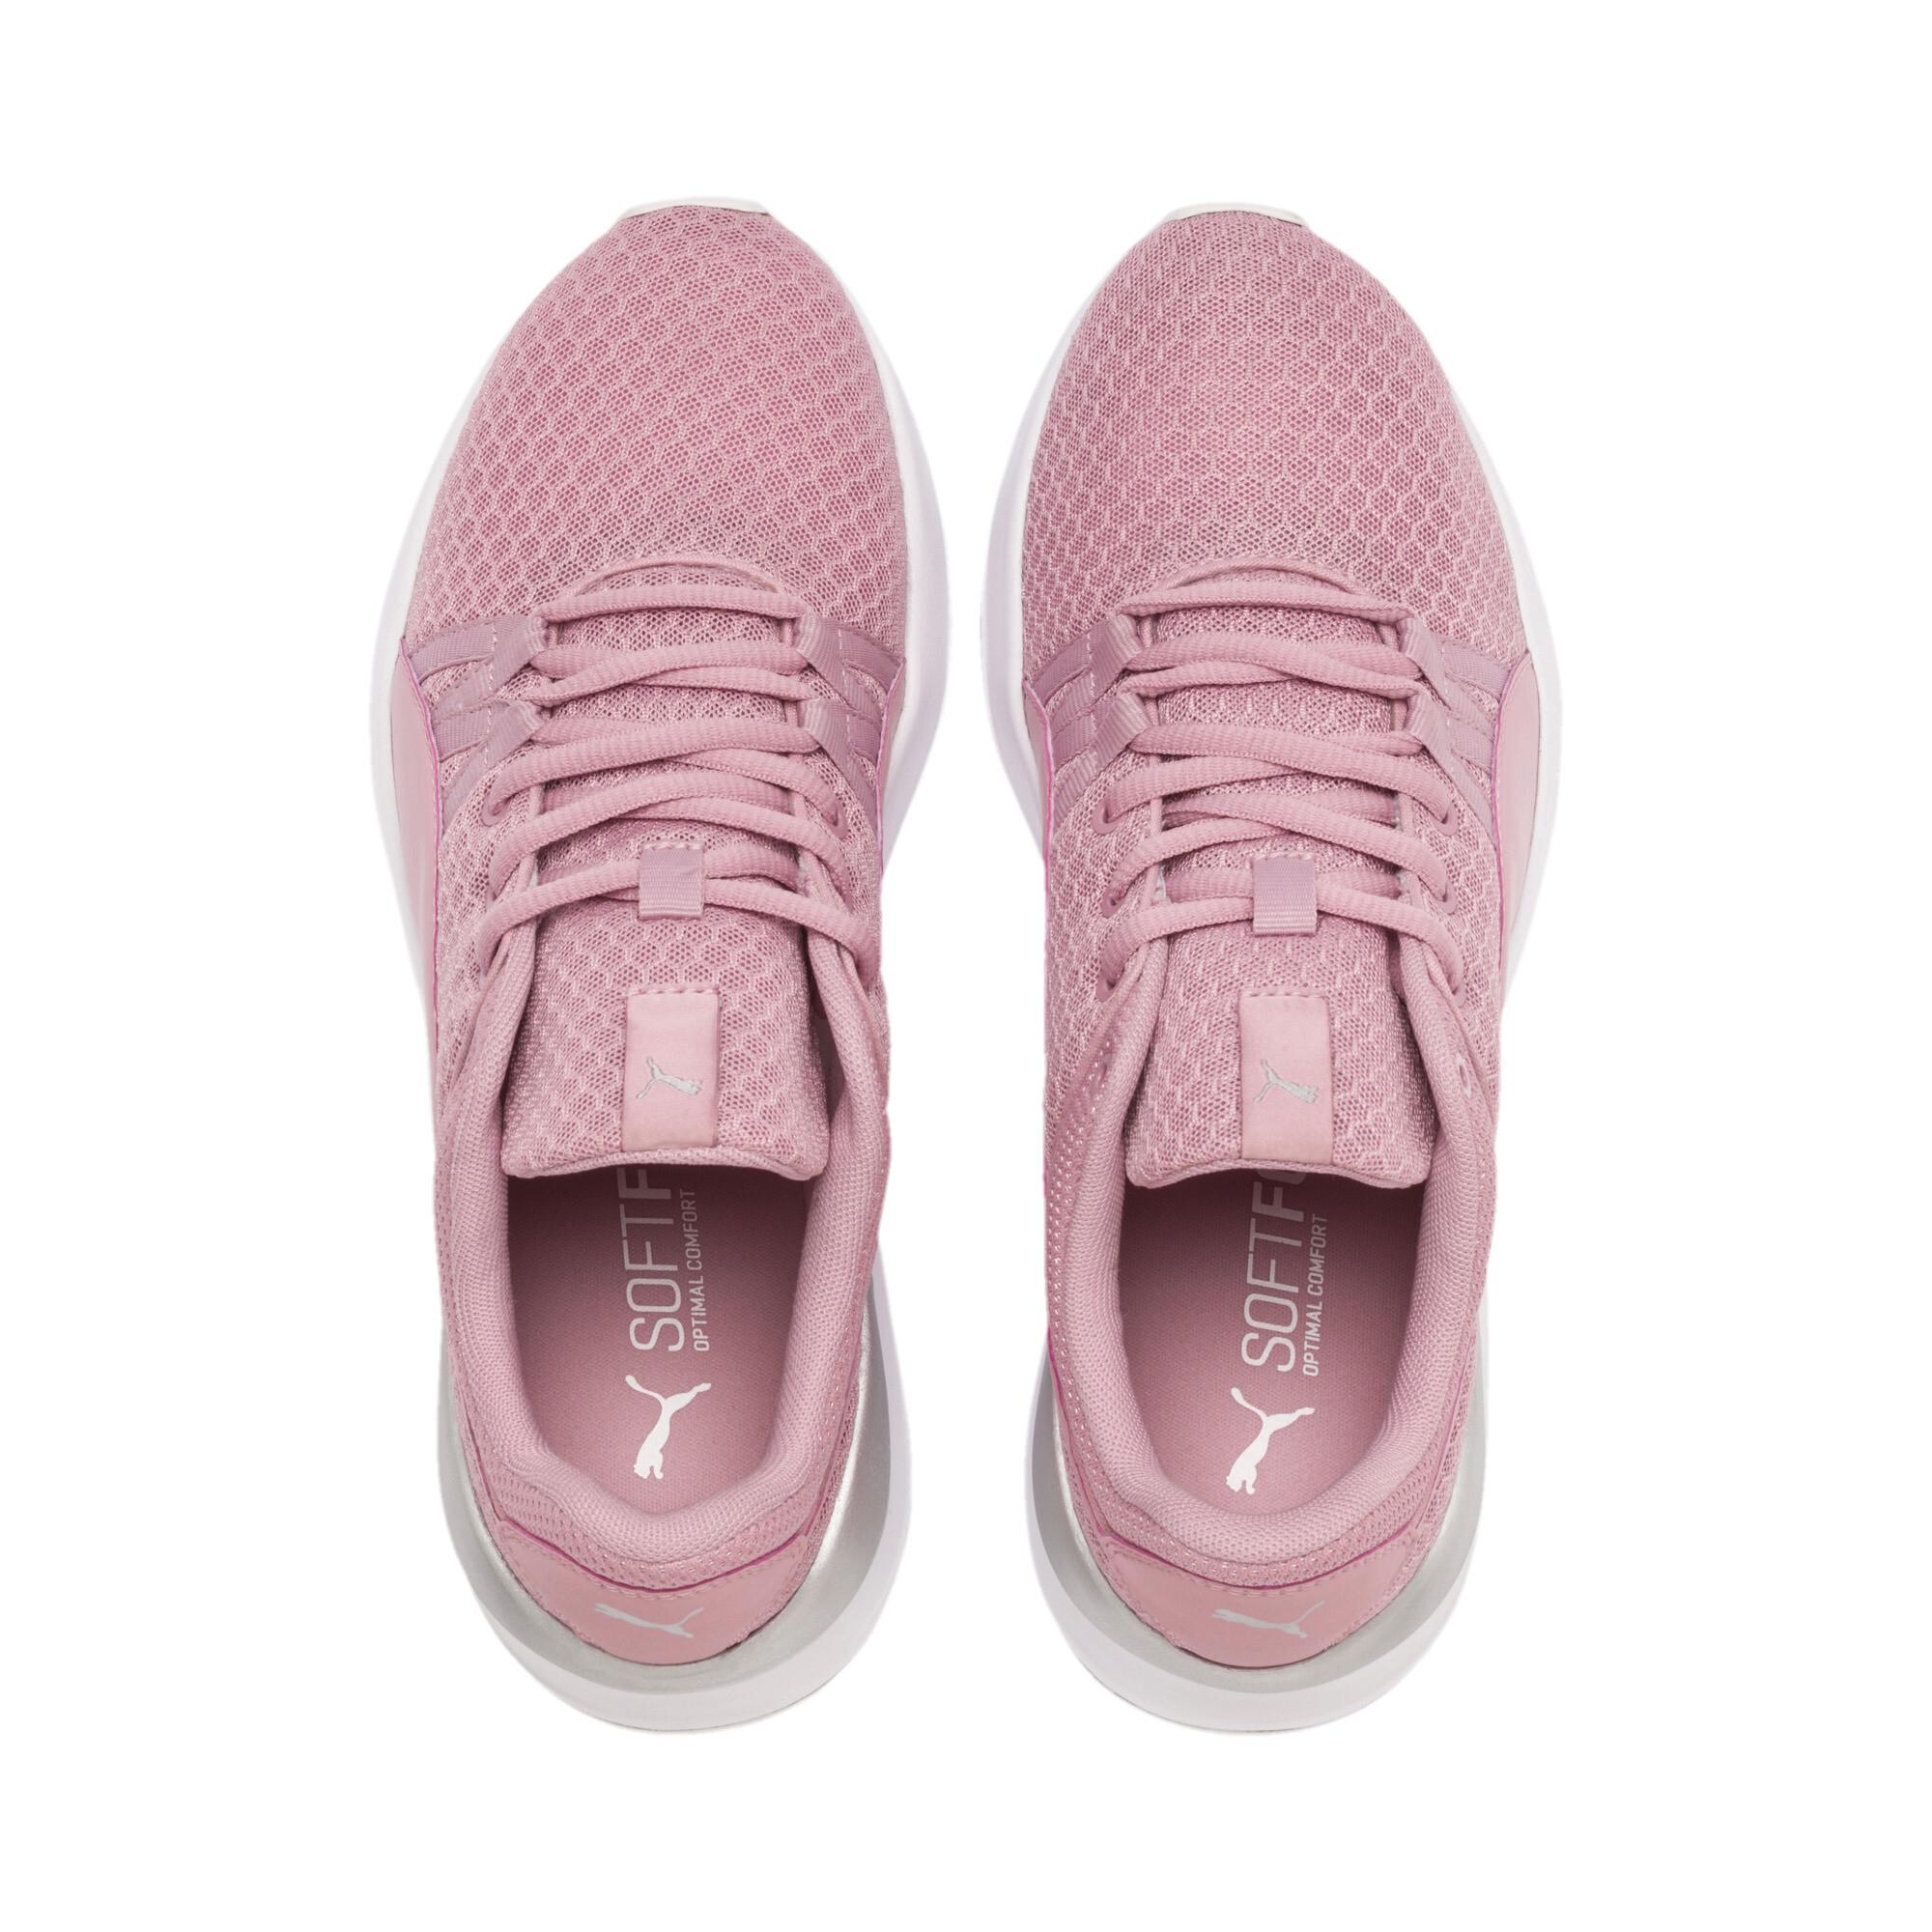 PUMA-Adela-Core-Women-s-Sneakers-Women-Shoe-Basics thumbnail 22